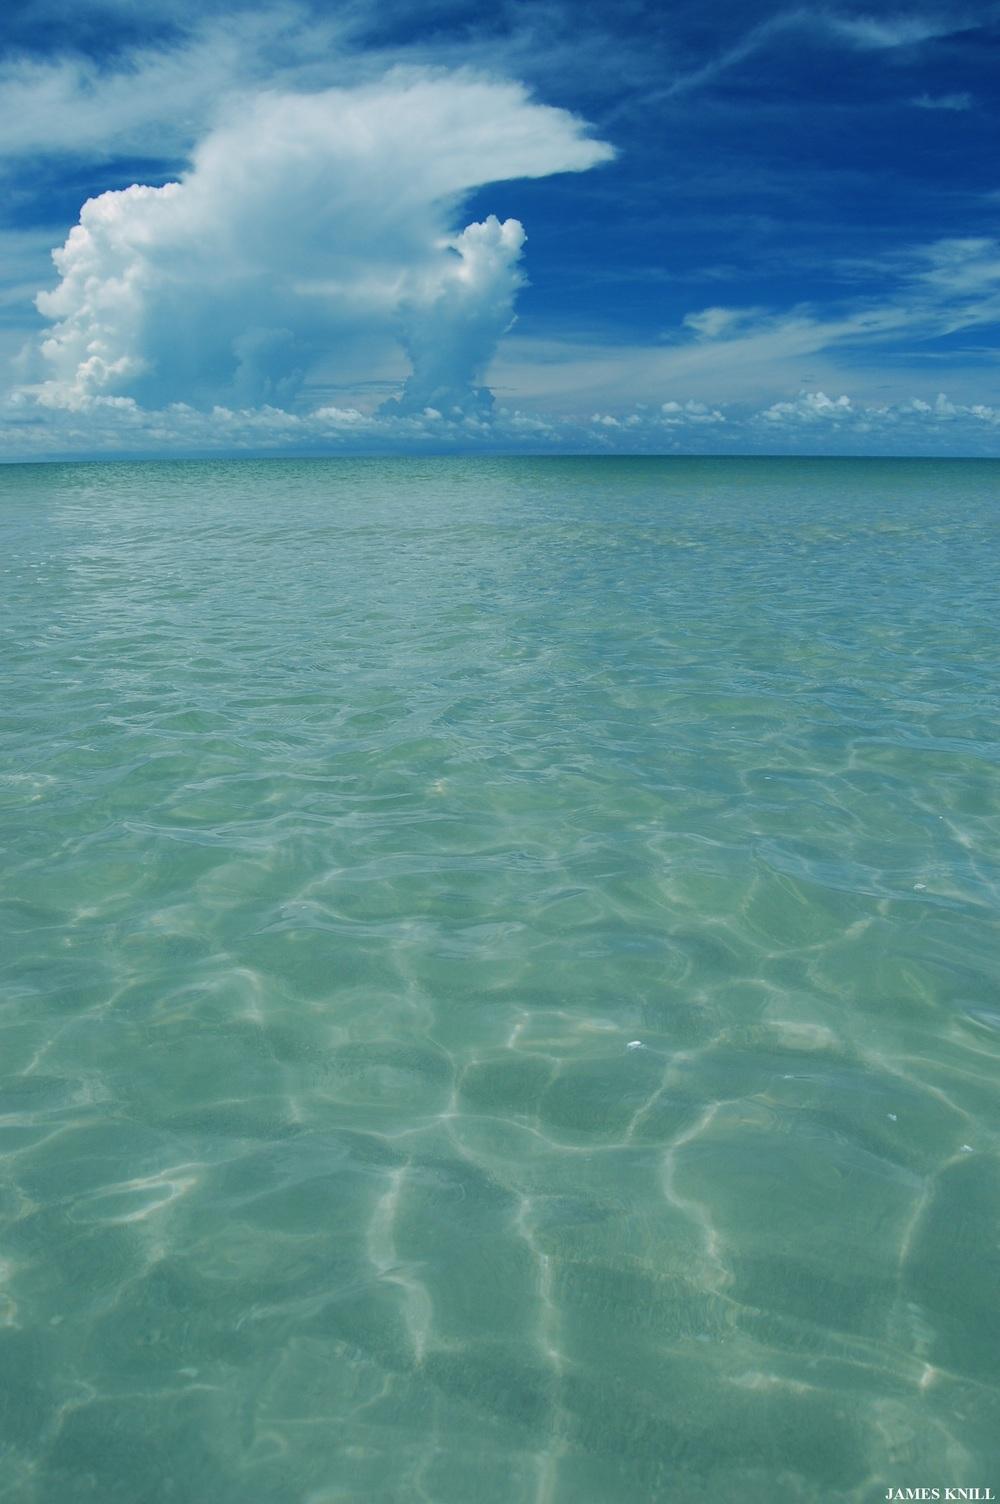 sanibel island6.jpg